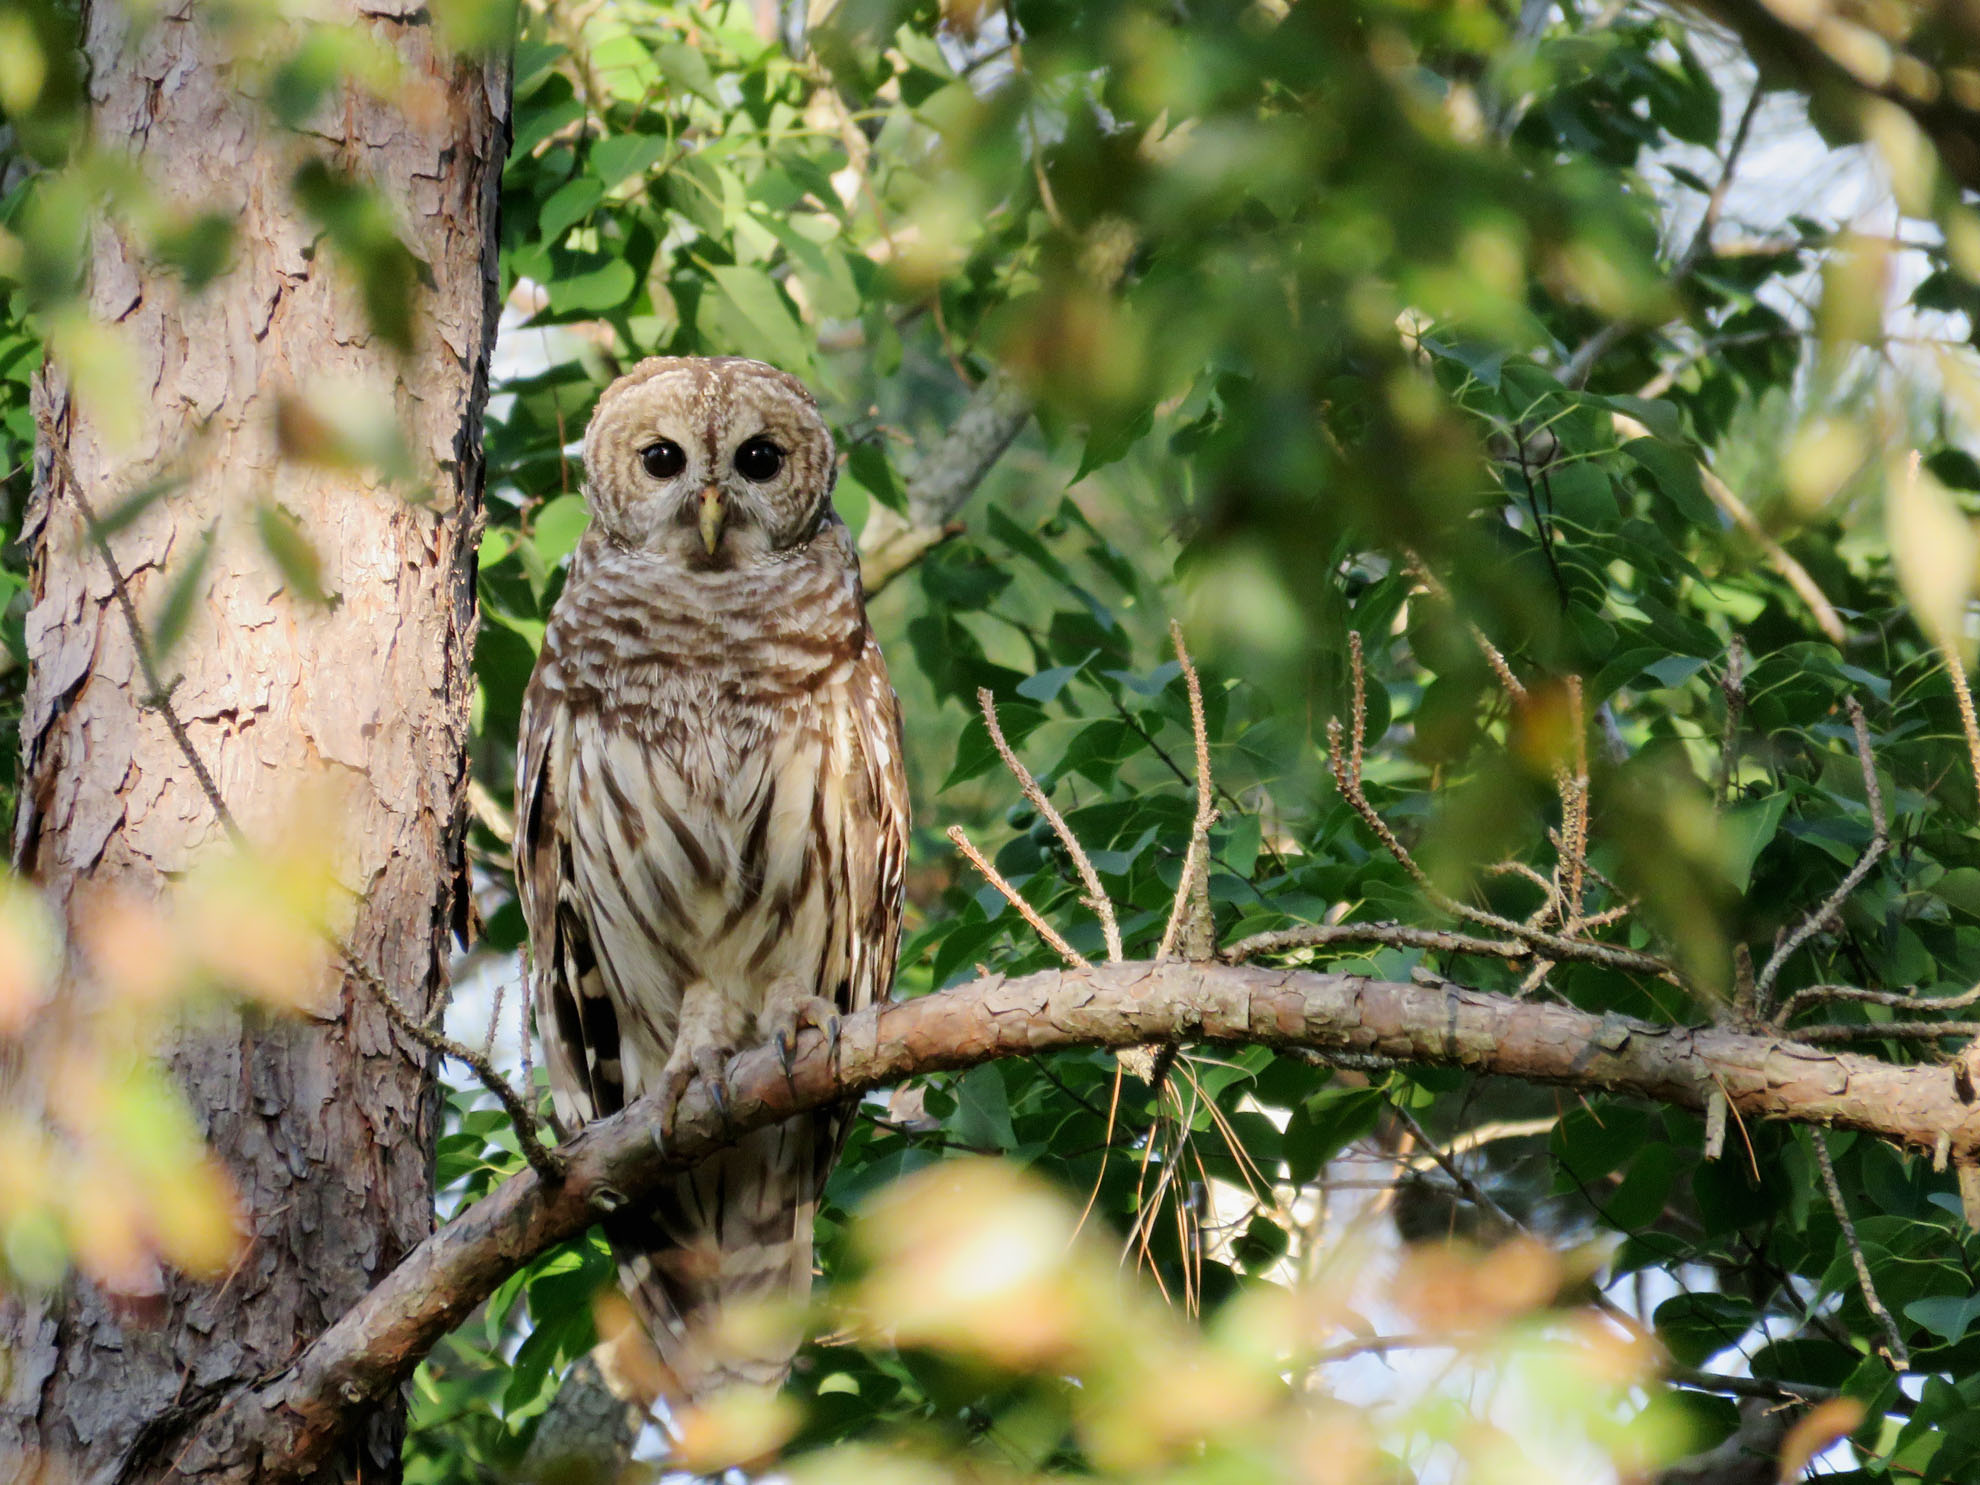 Bird Fanfares